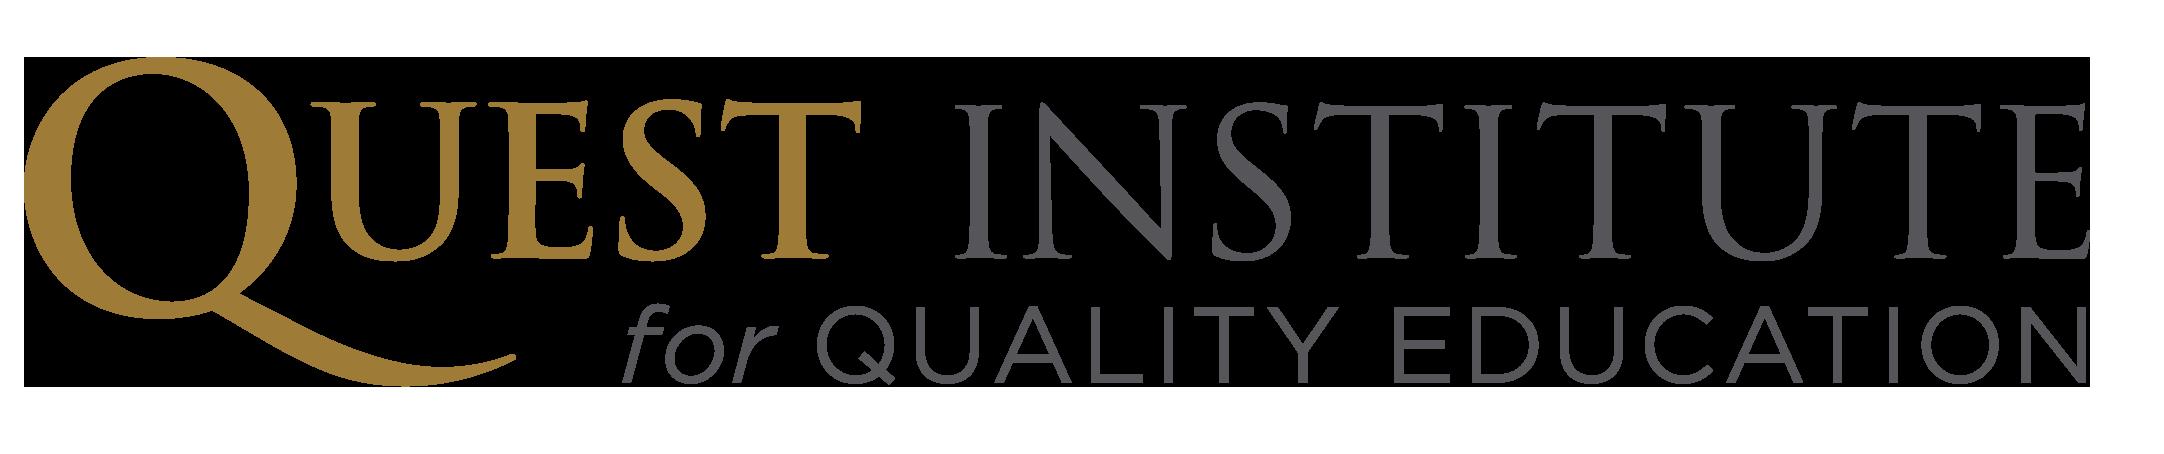 Quest Institute.png